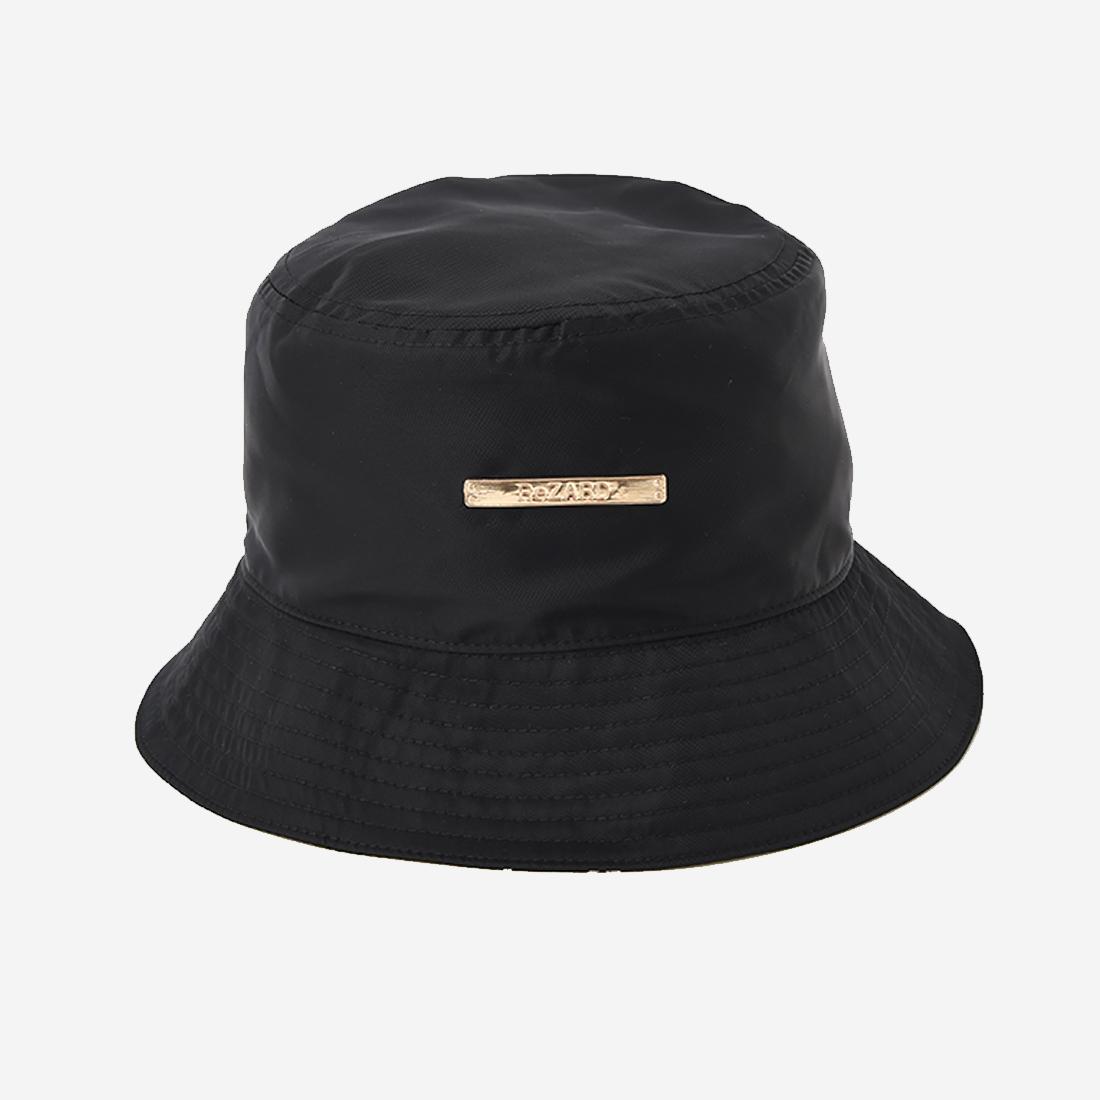 【ReZARD】Plate Bucket Hat